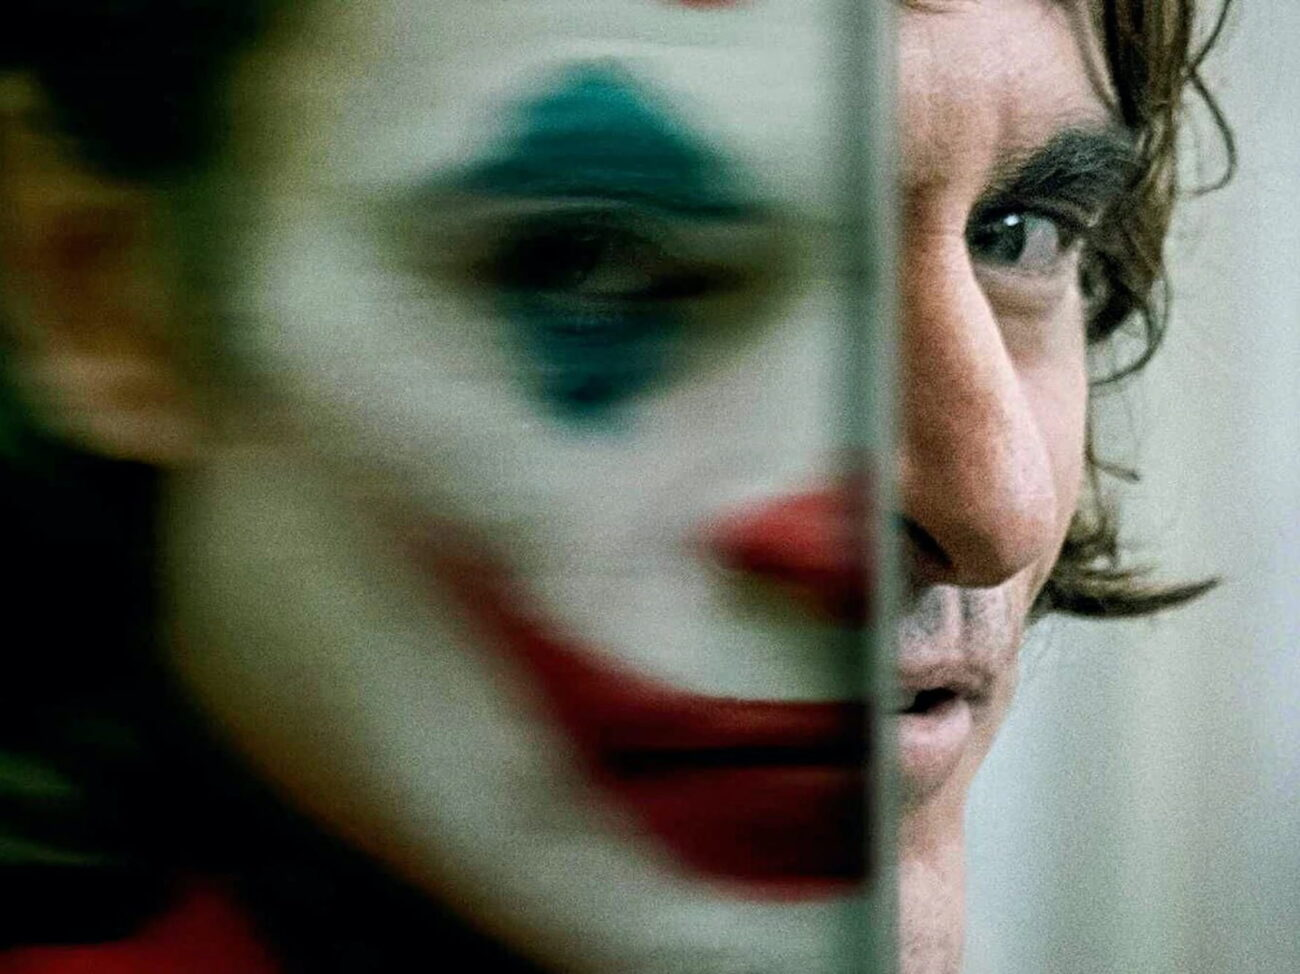 As director Matt Reeves confirms that 'The Batman' will begin a trilogy, many wonder if the Joker will make an appearance. What other villains will return?